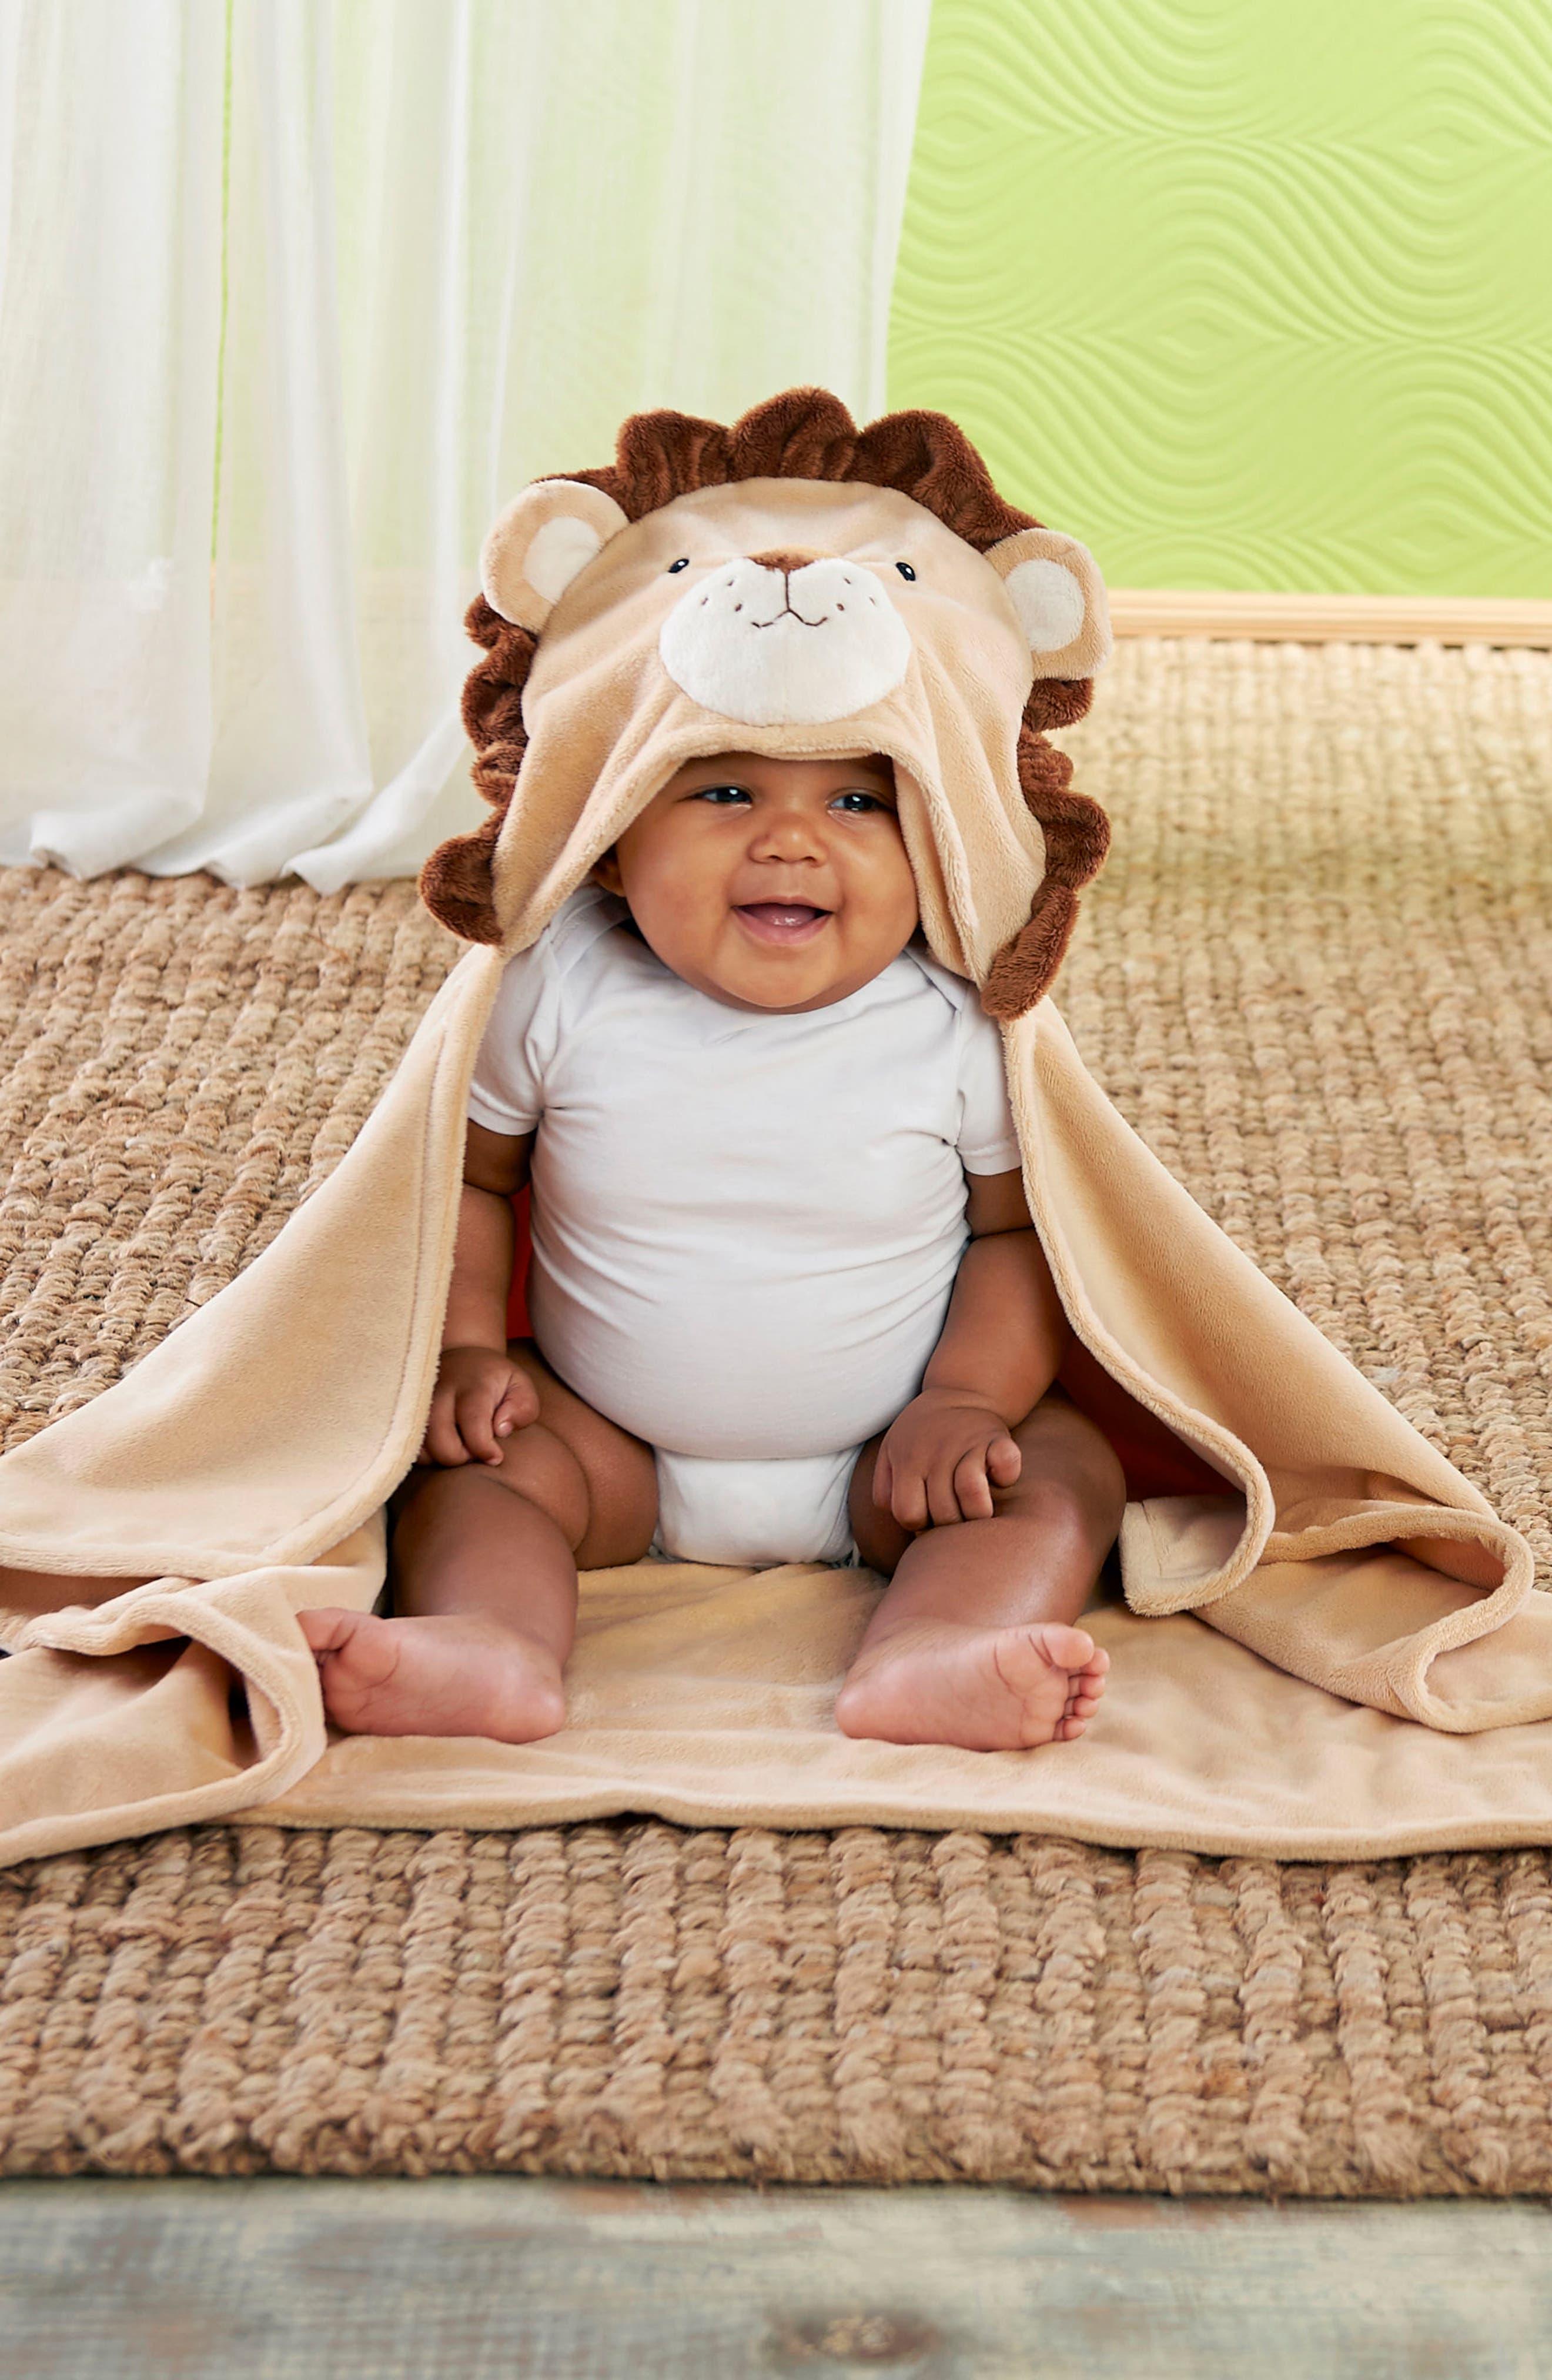 Lion Safari Hooded Blanket, 3-Pack Socks & Stuffed Animal Set,                             Alternate thumbnail 3, color,                             200